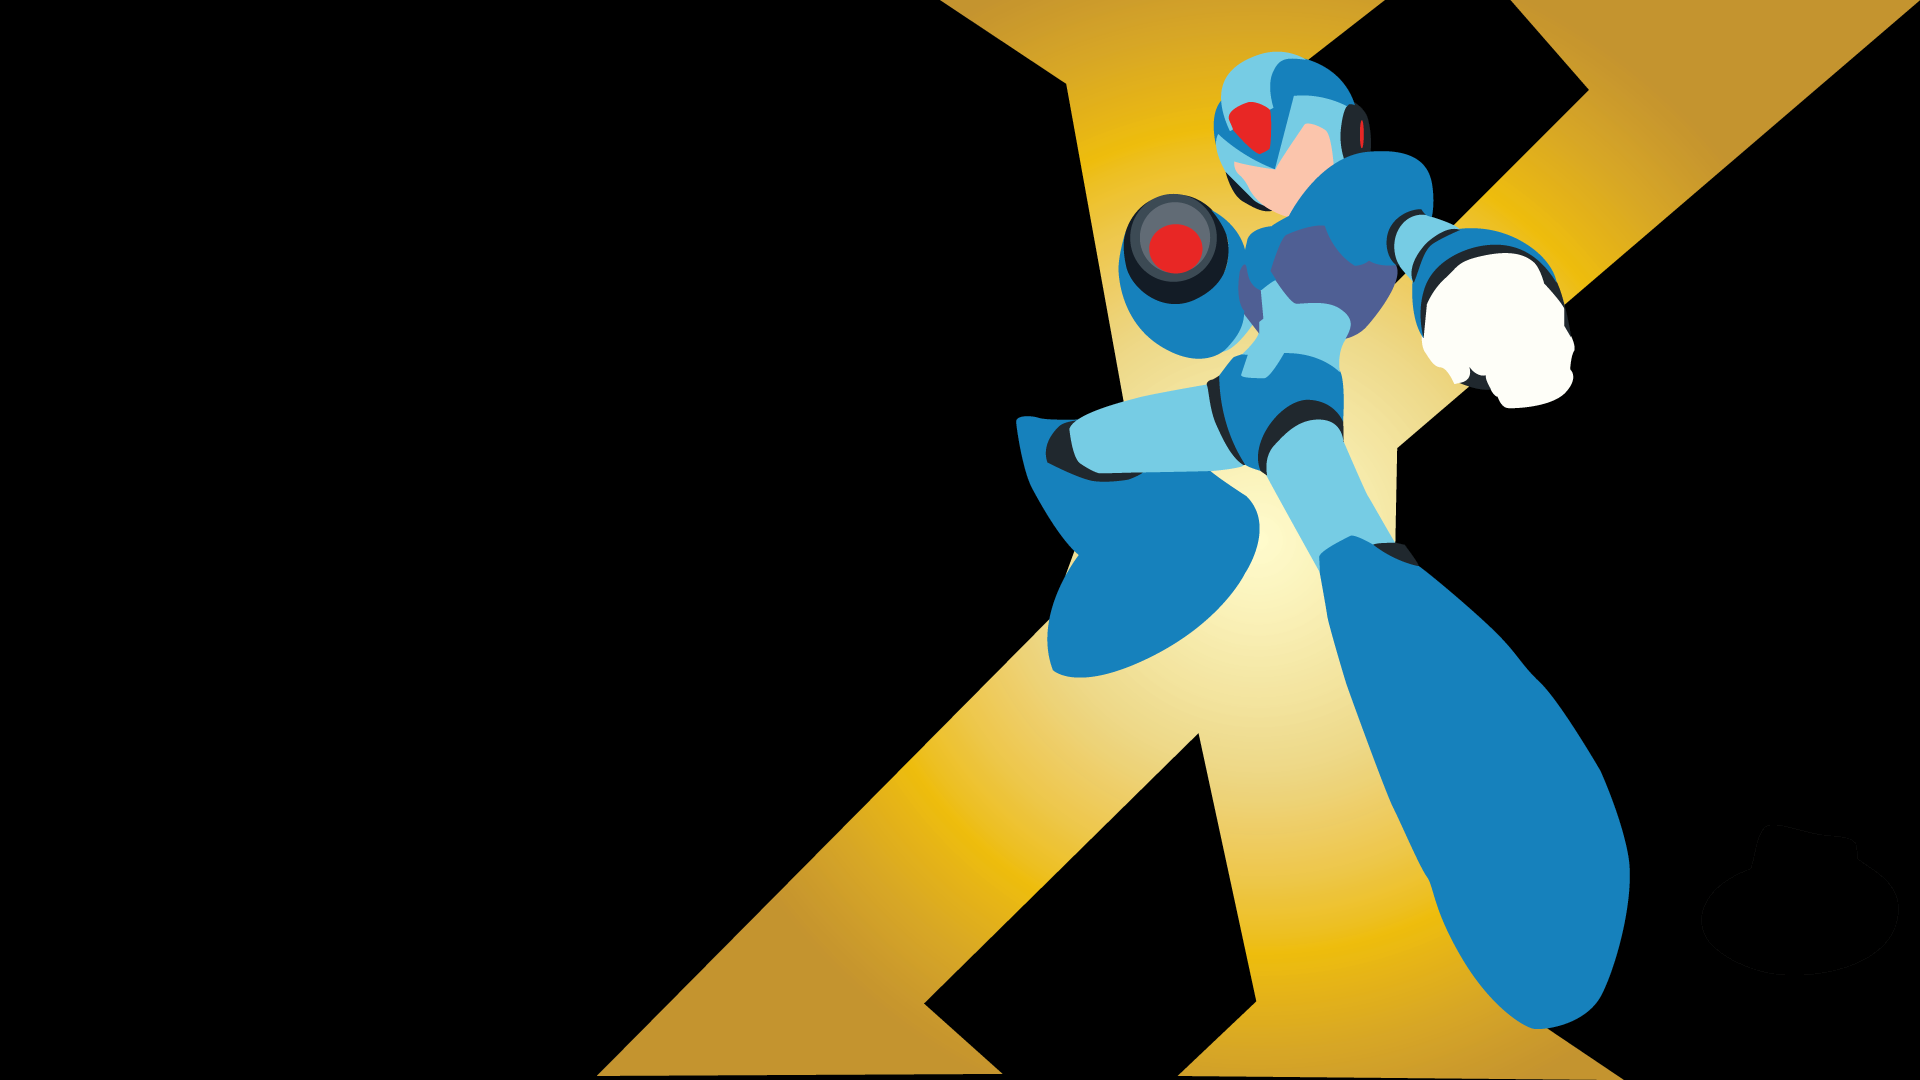 46+] Megaman X Wallpapers on WallpaperSafari